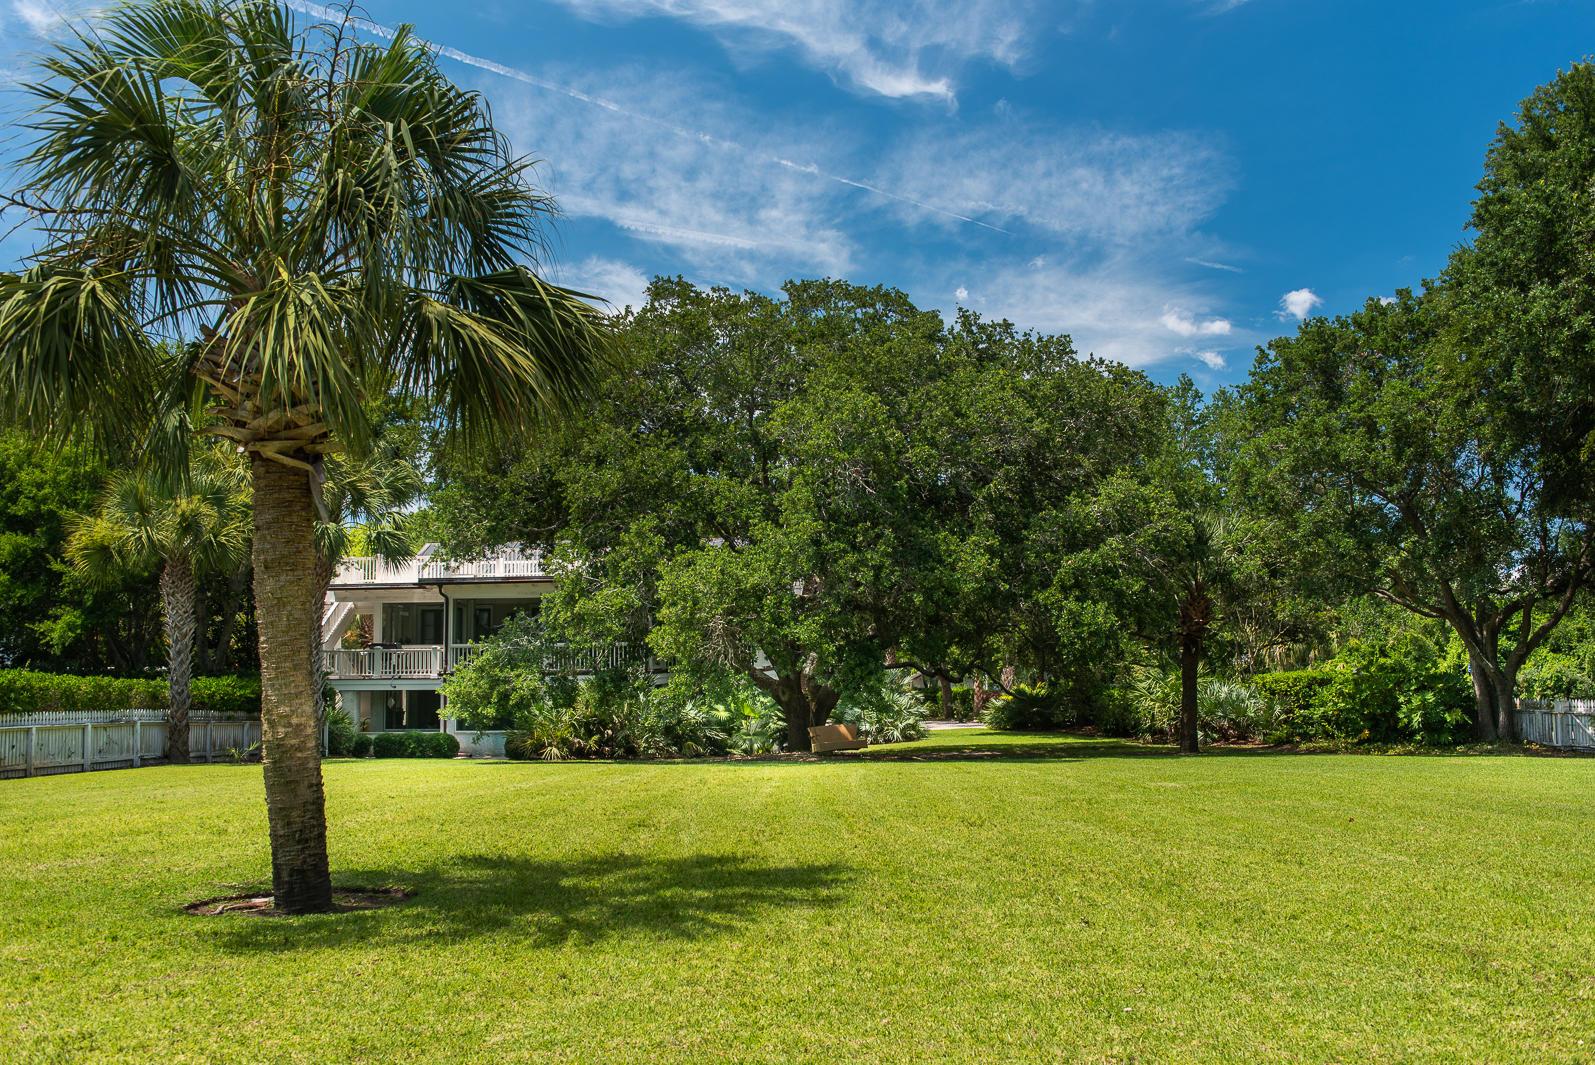 Sullivans Island Homes For Sale - 1773 Atlantic, Sullivans Island, SC - 6